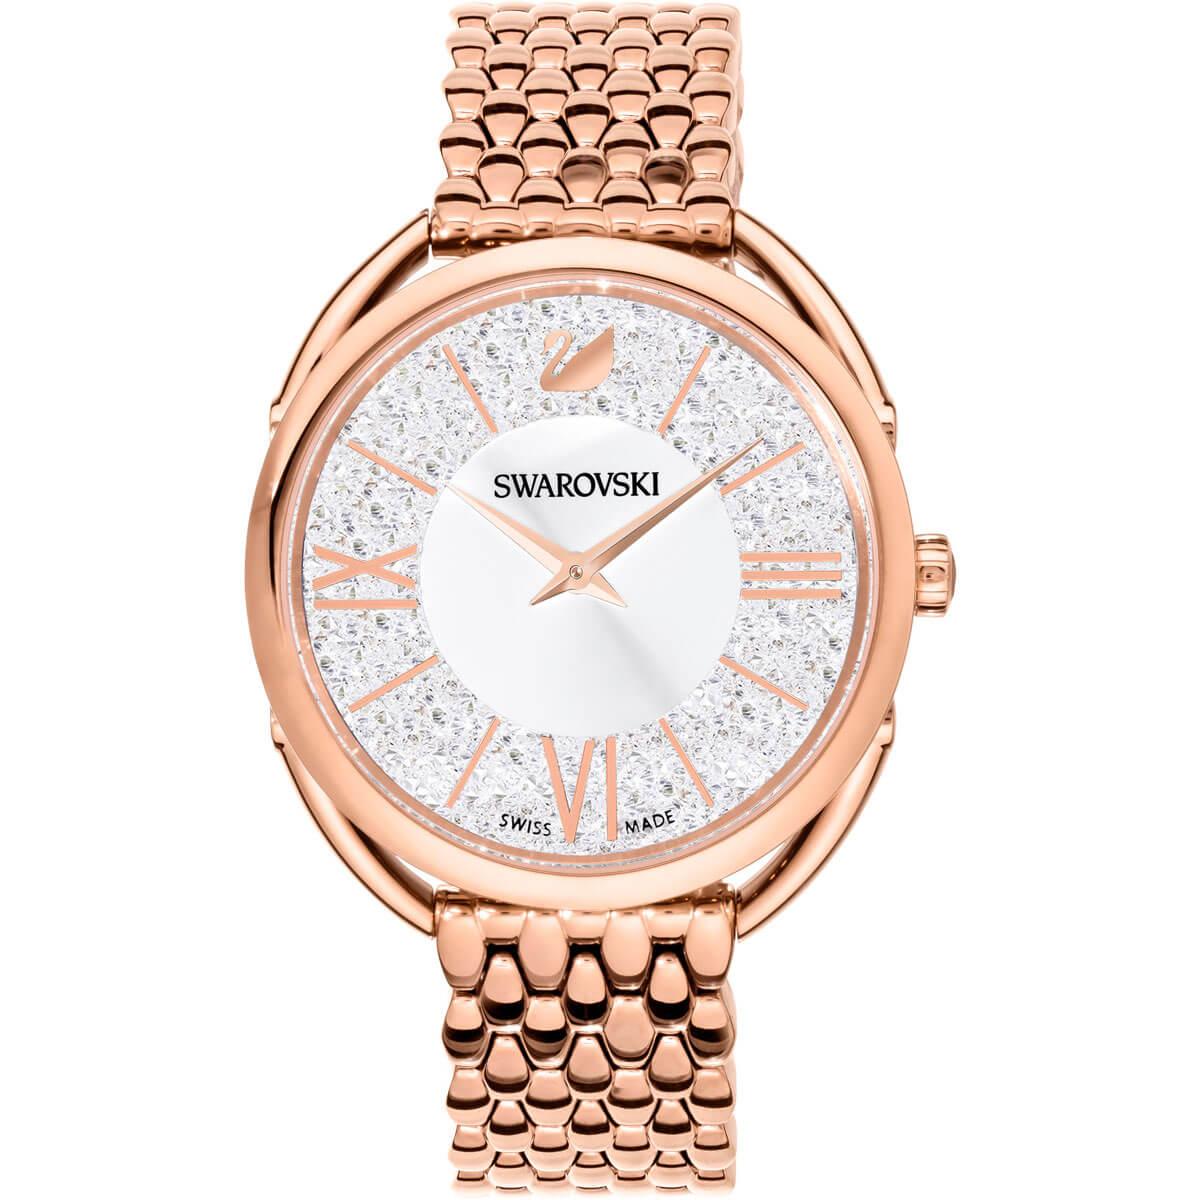 Swarovski Crystalline Glam Watch, Metal bracelet, White, Rose Gold